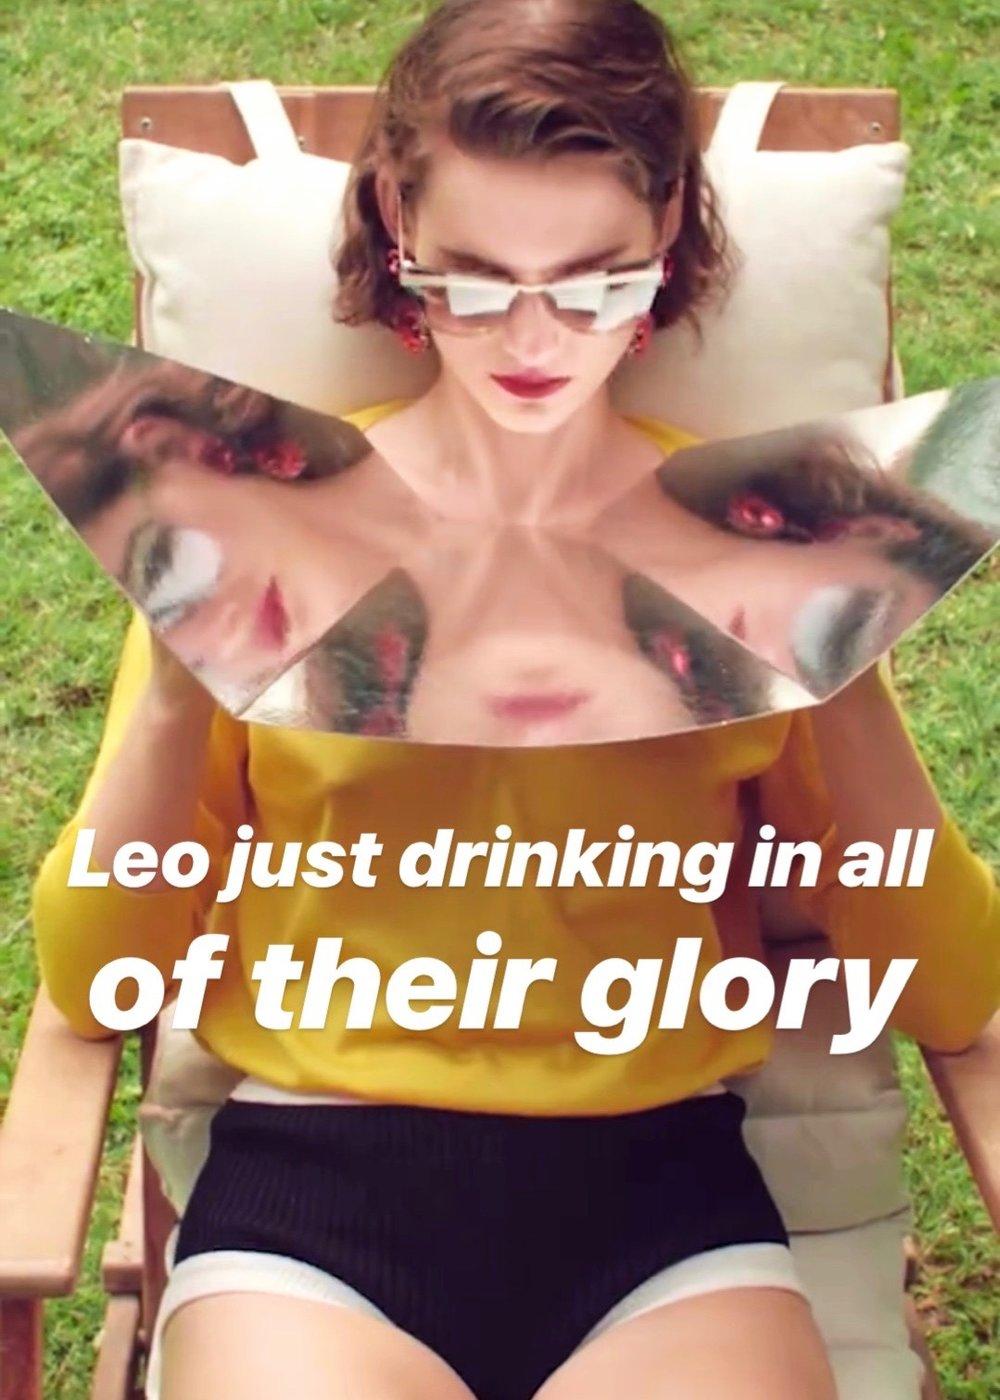 TBP_Musing_Meme_Zodiac_Leo.jpg